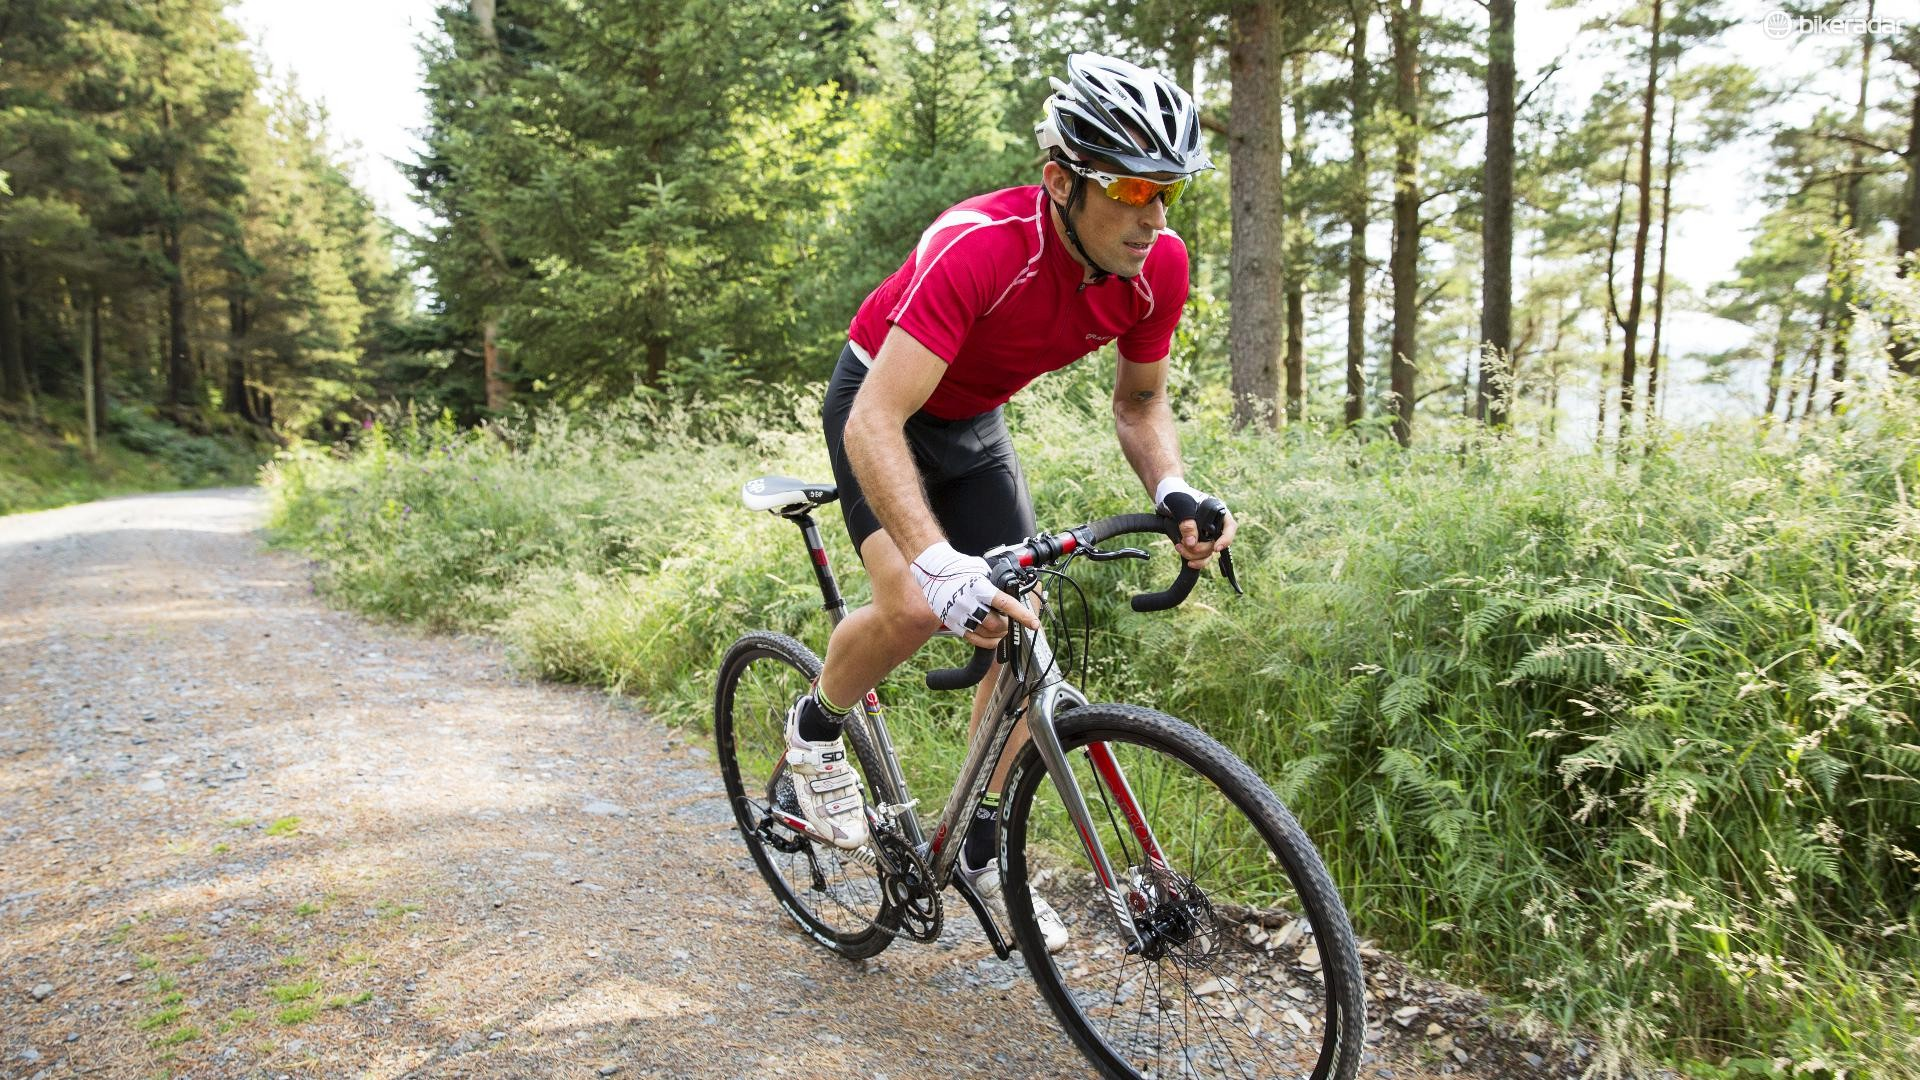 Cyclocross bikes also make good commuter bikes